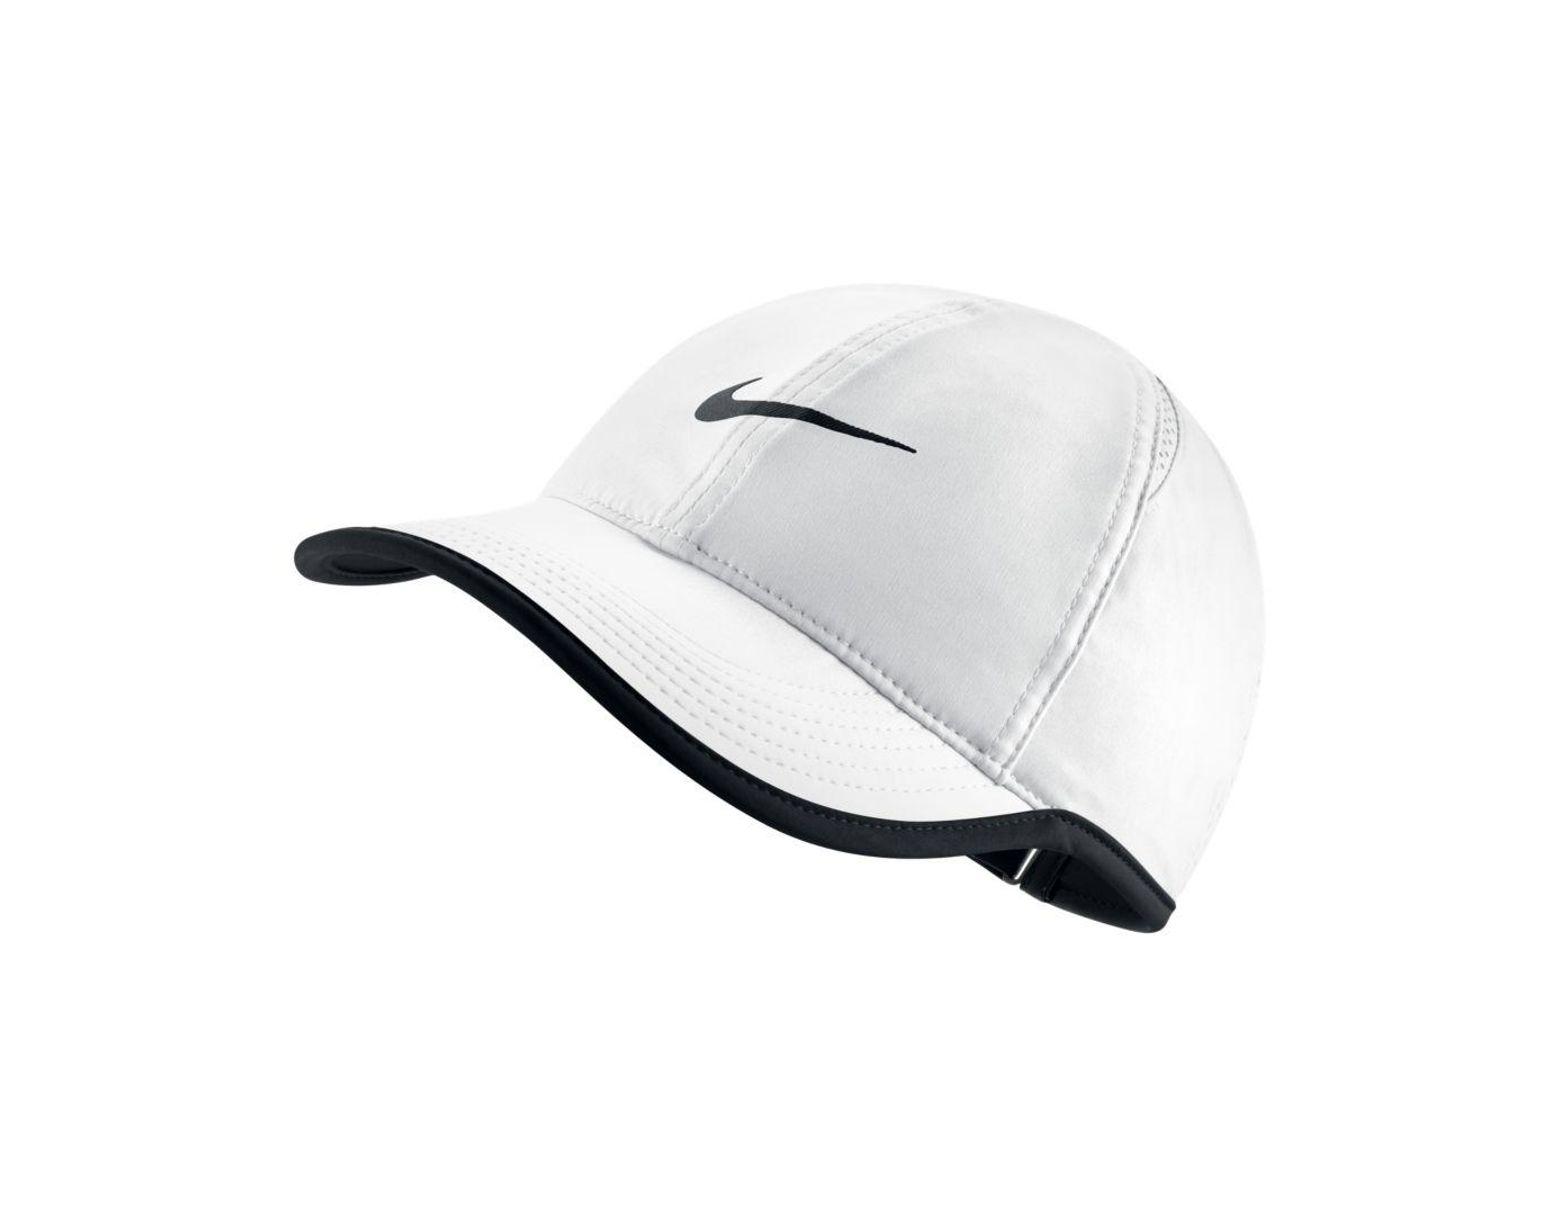 0487d1644 Women's White Court Aerobill Featherlight Tennis Cap